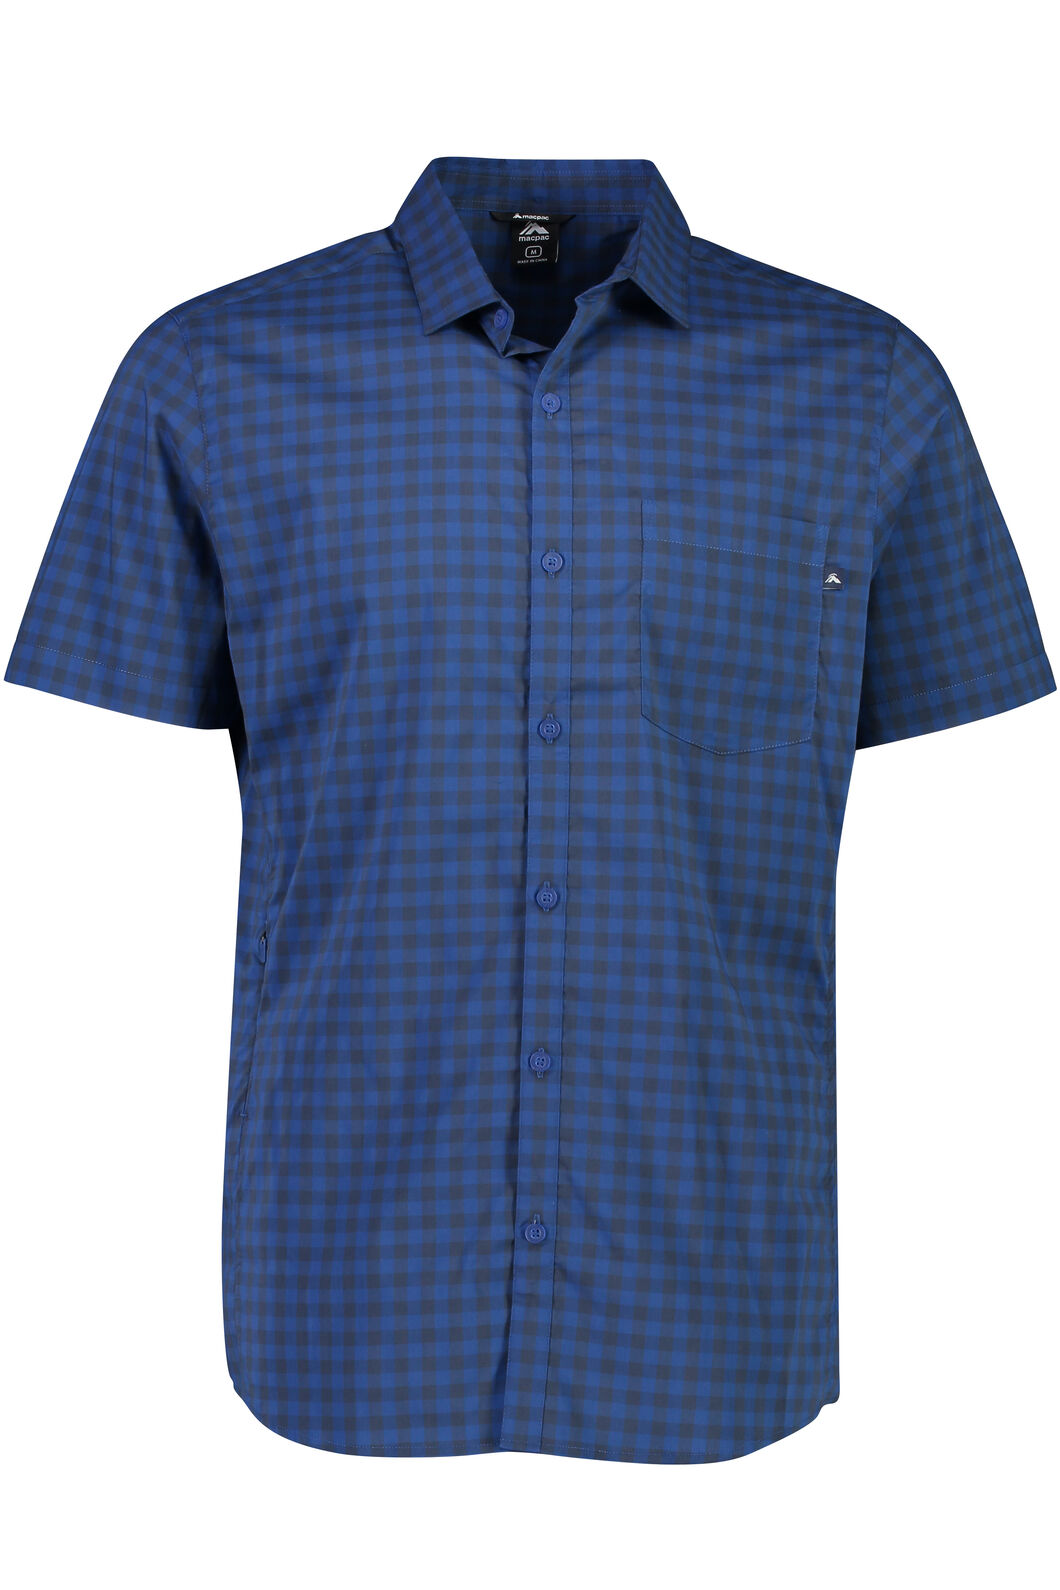 Macpac Crossroad Short Sleeve Shirt - Men's, Black Iris, hi-res